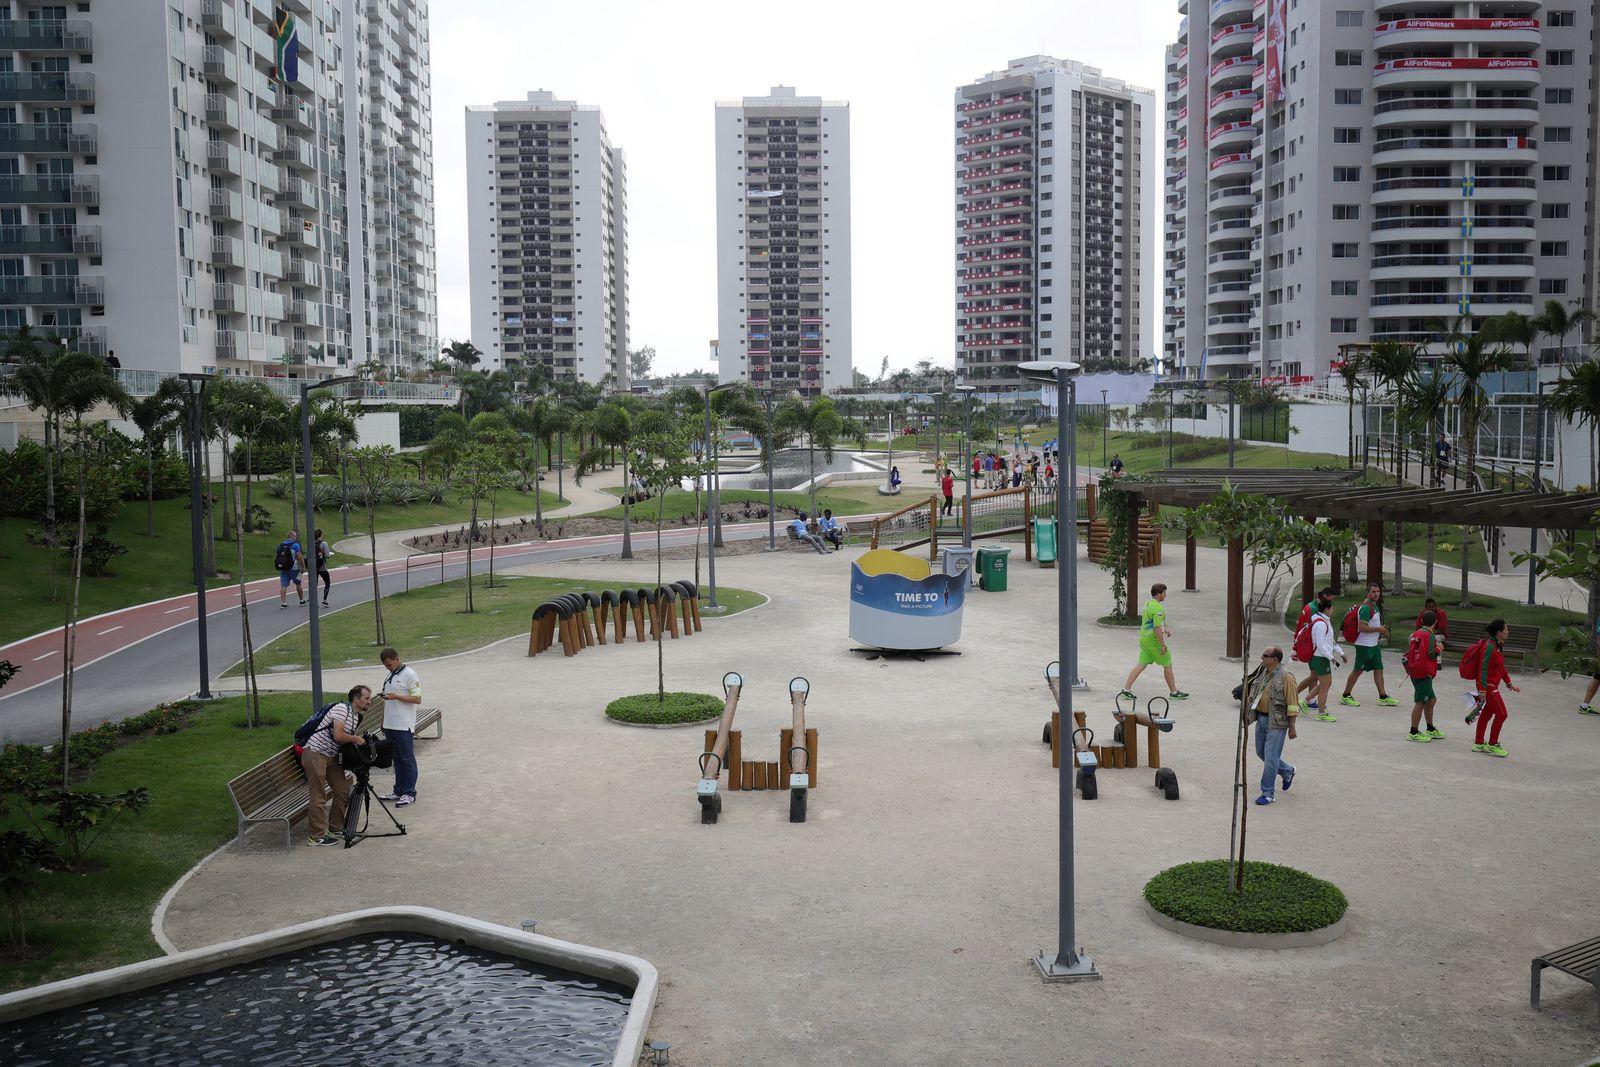 Rio 2016 - Olympic Village